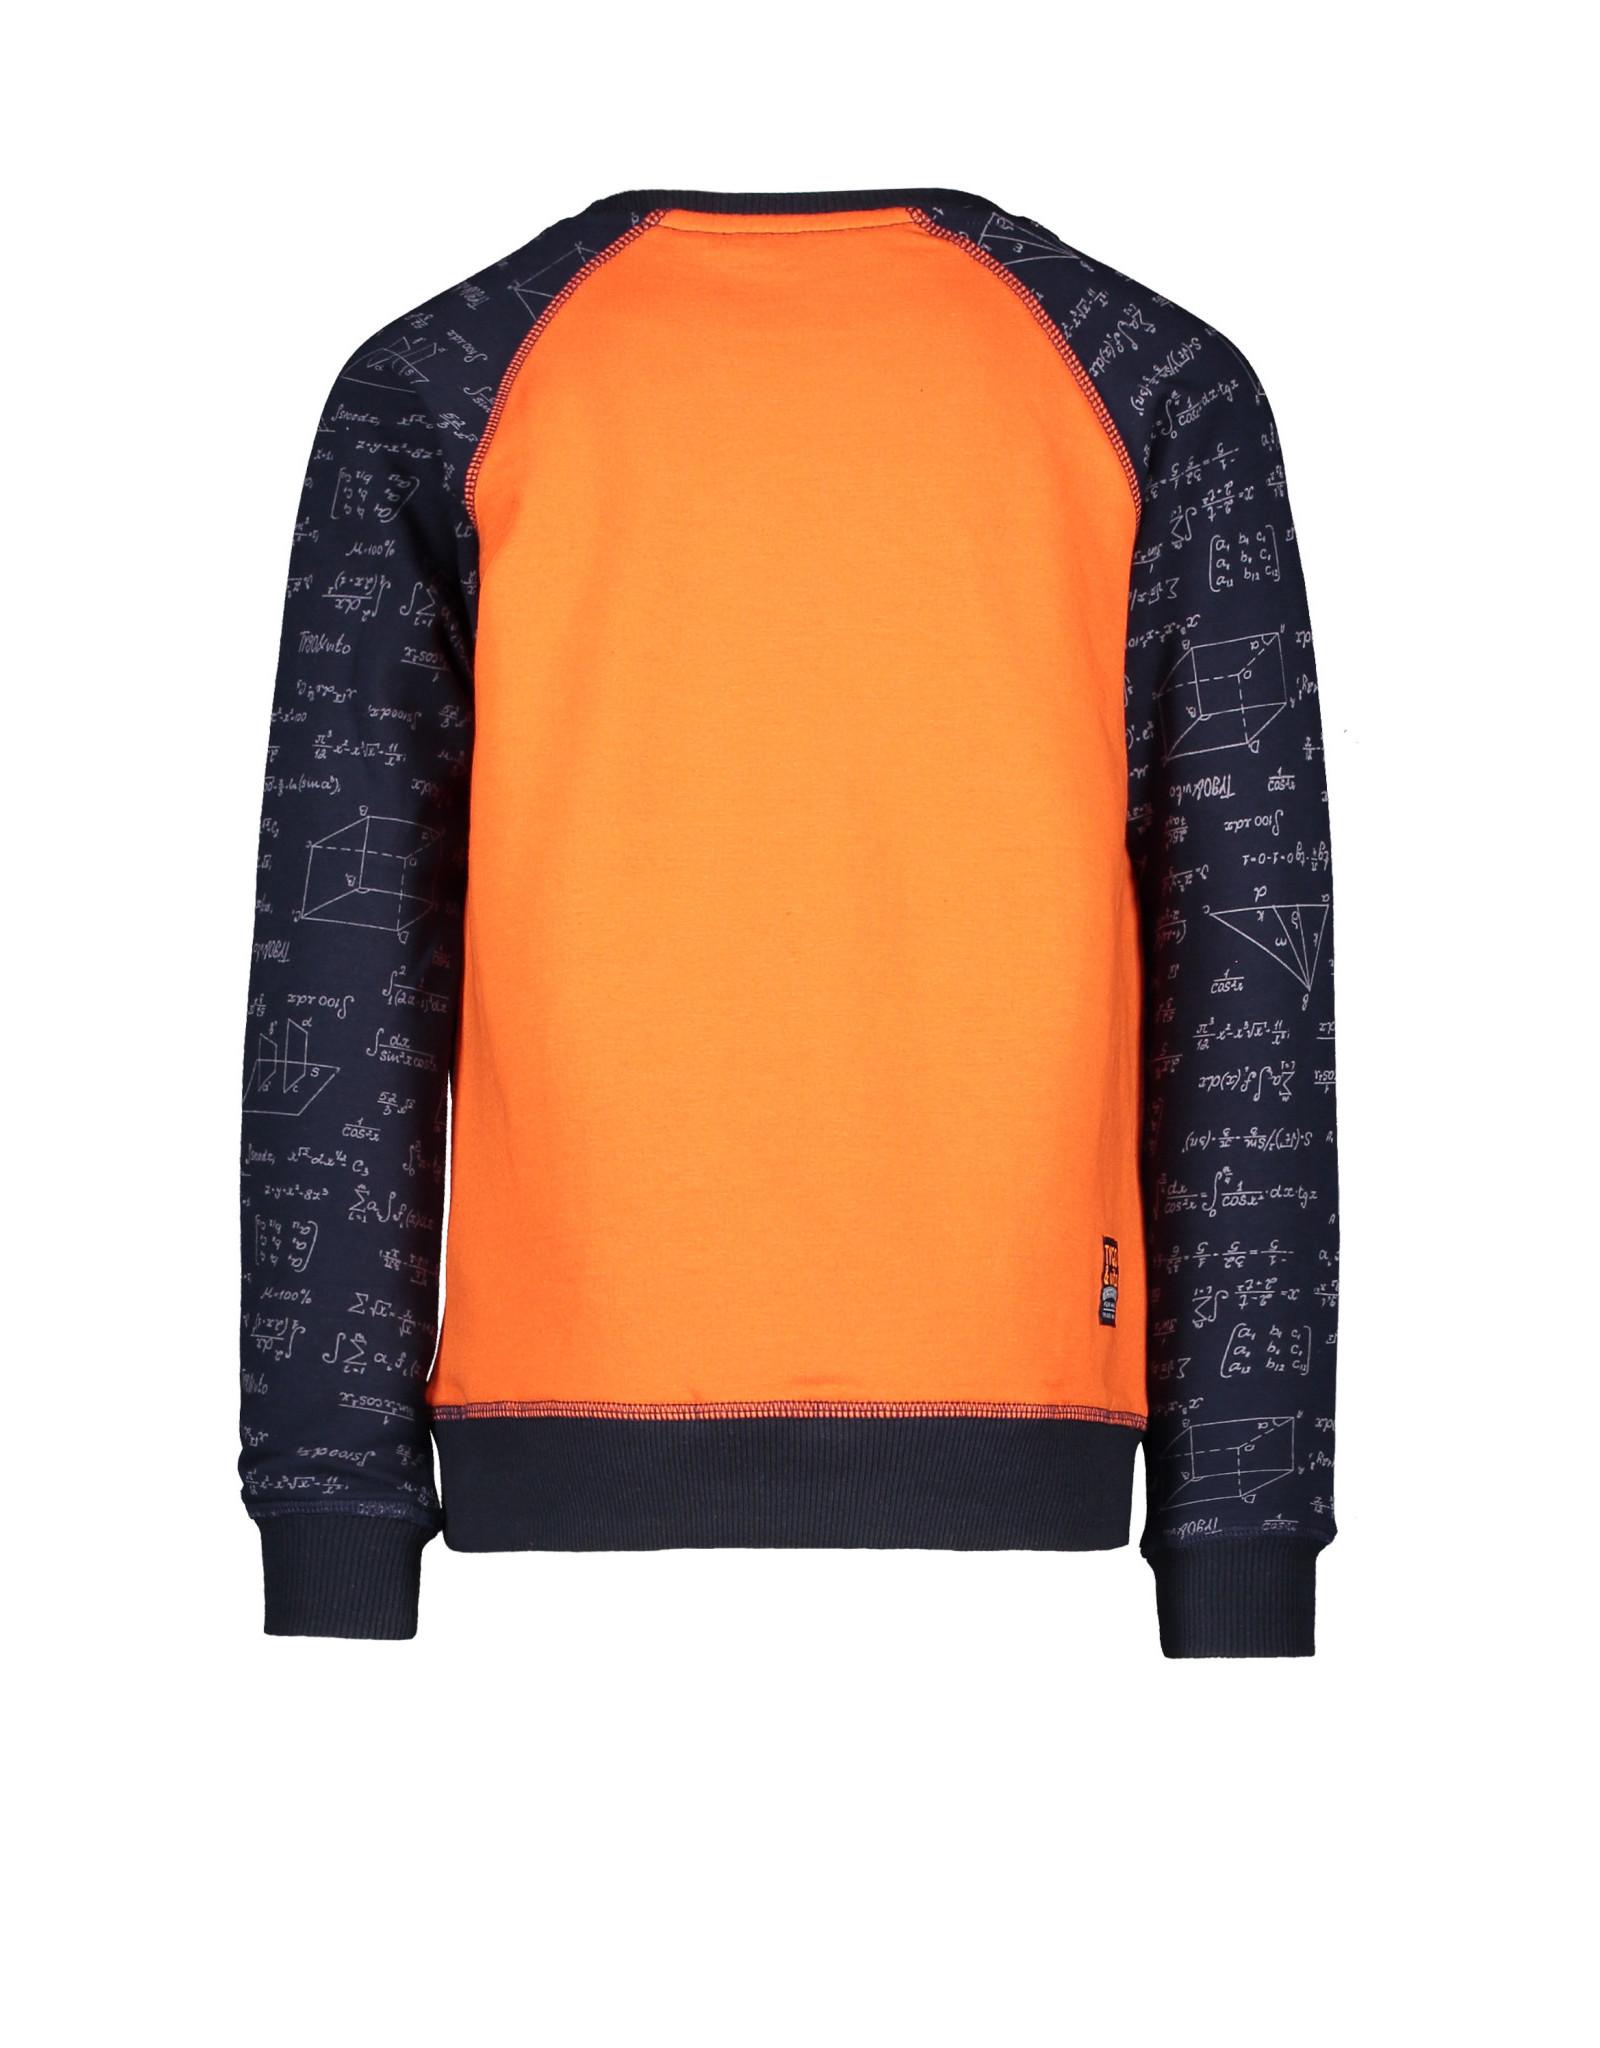 TYGO & vito TYGO & vito jongens sweater Genius Navy